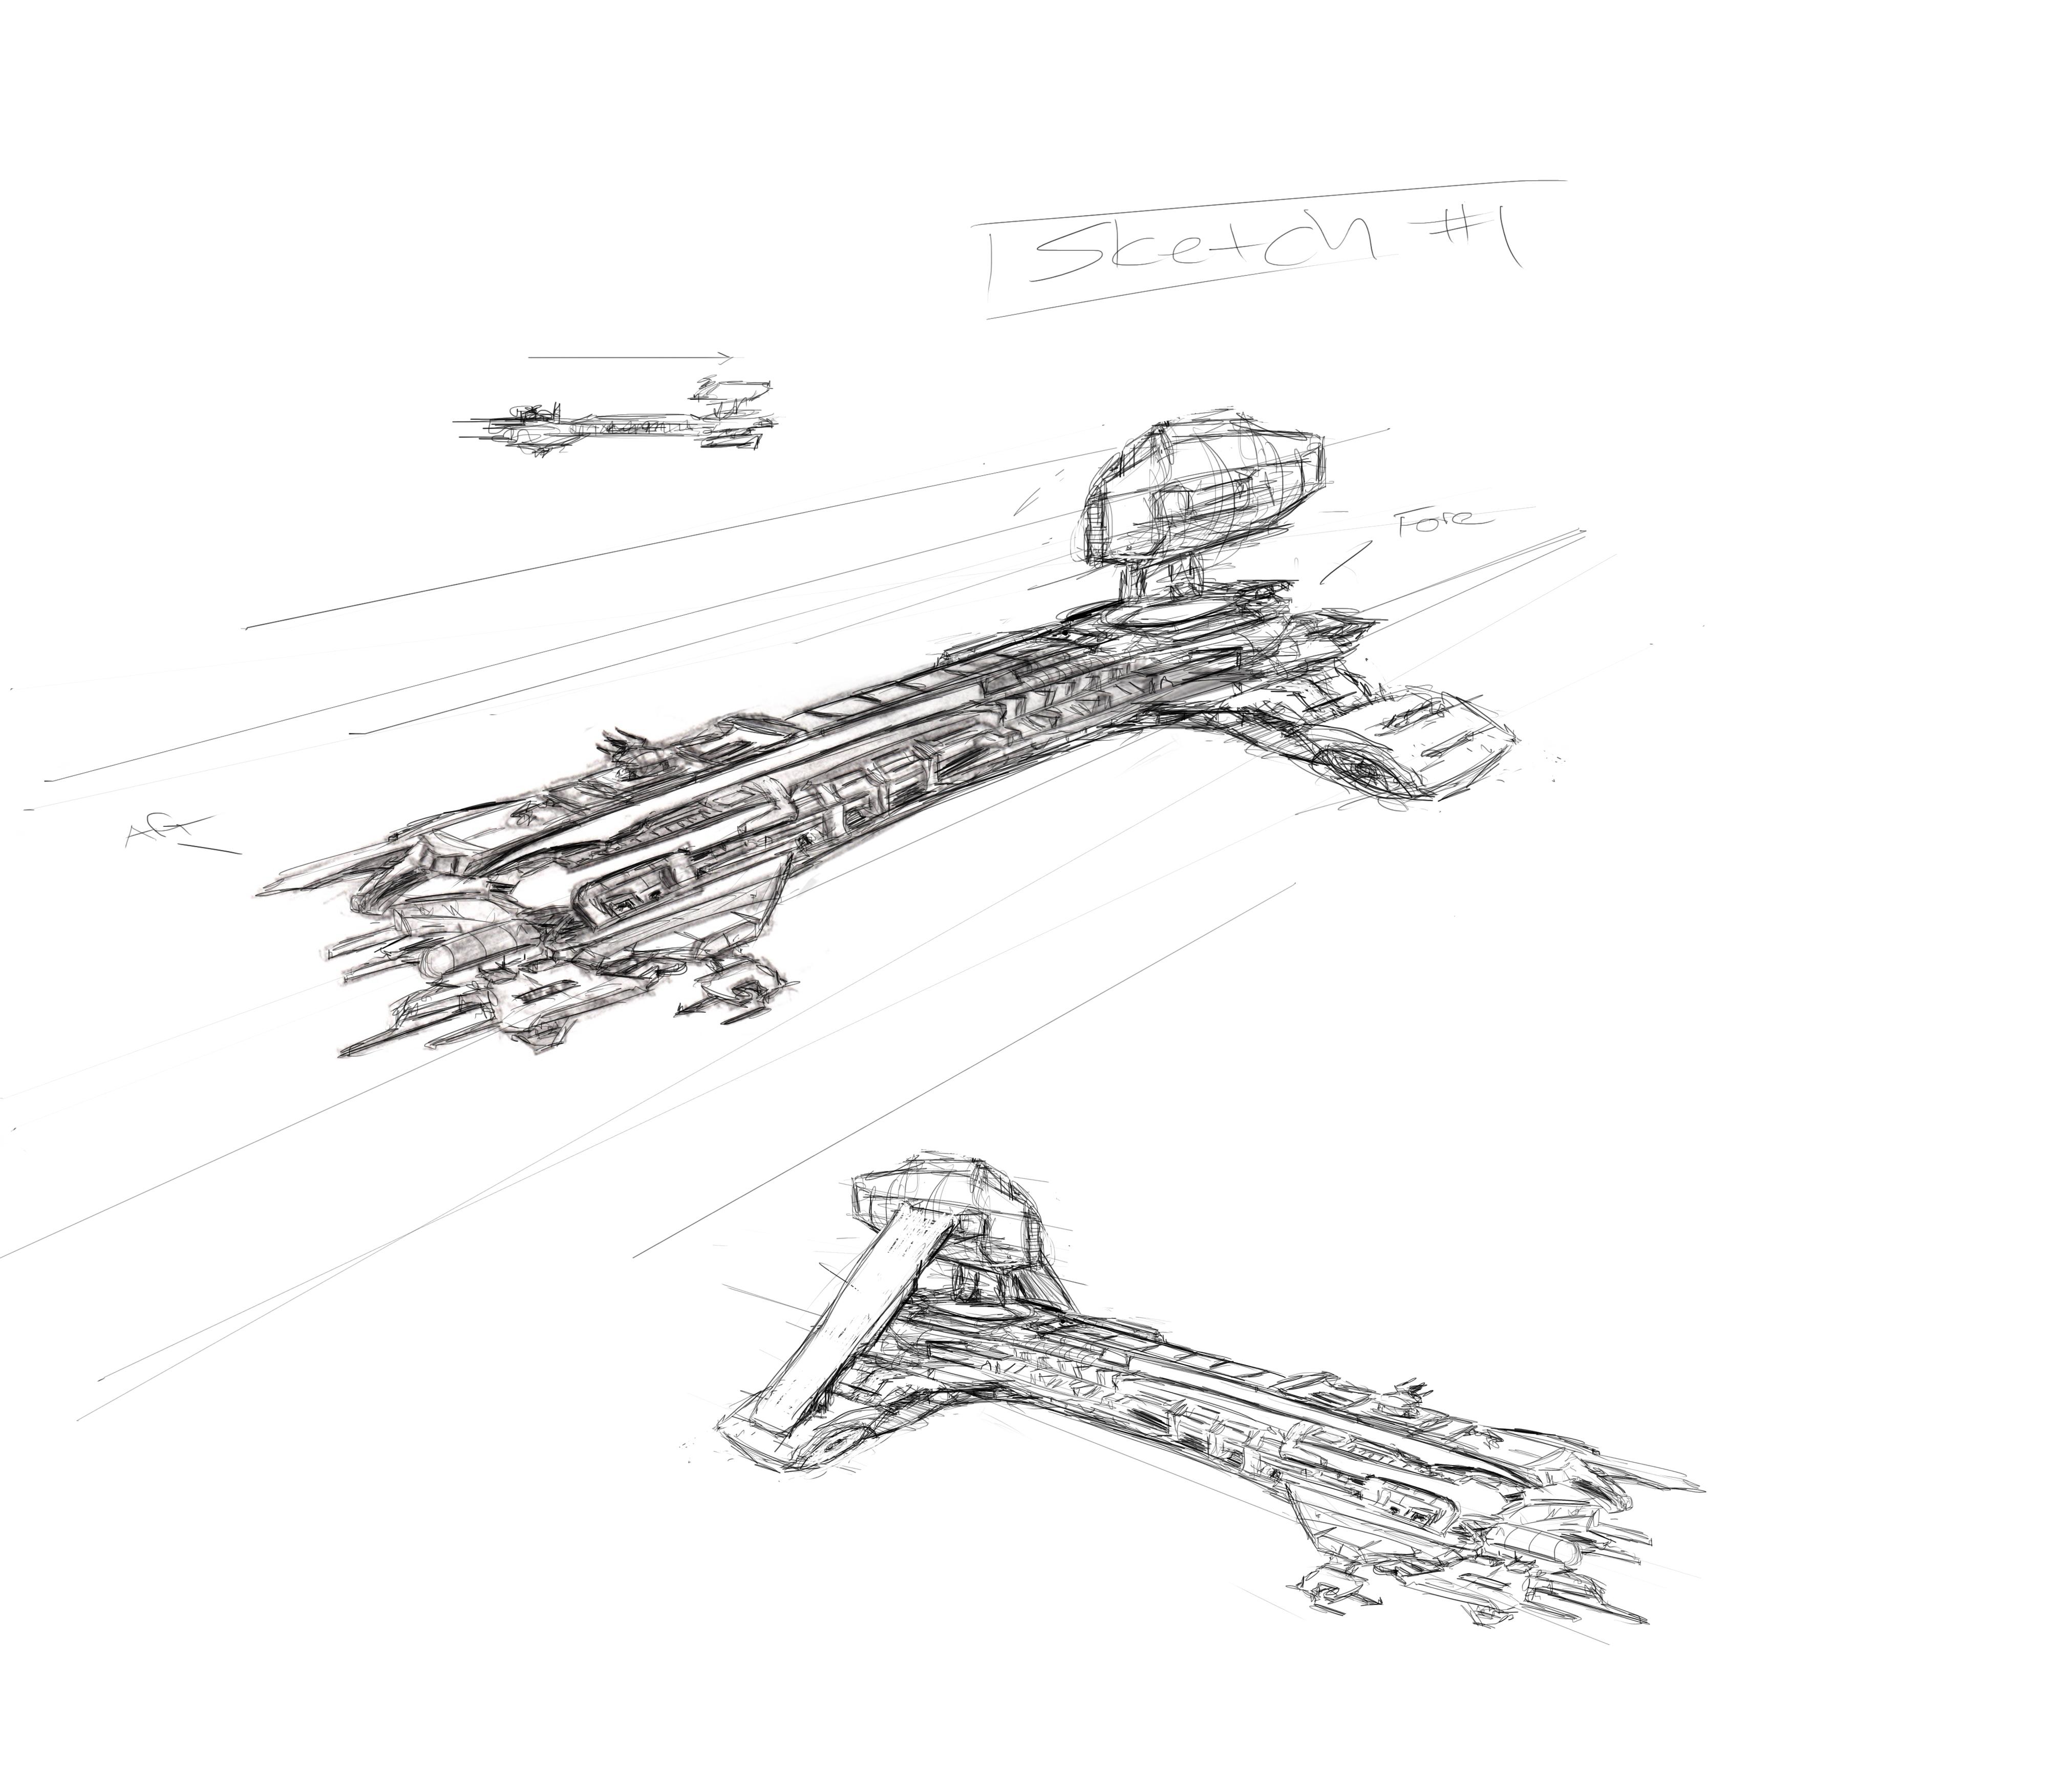 4000x3500 Spaceship Sketch